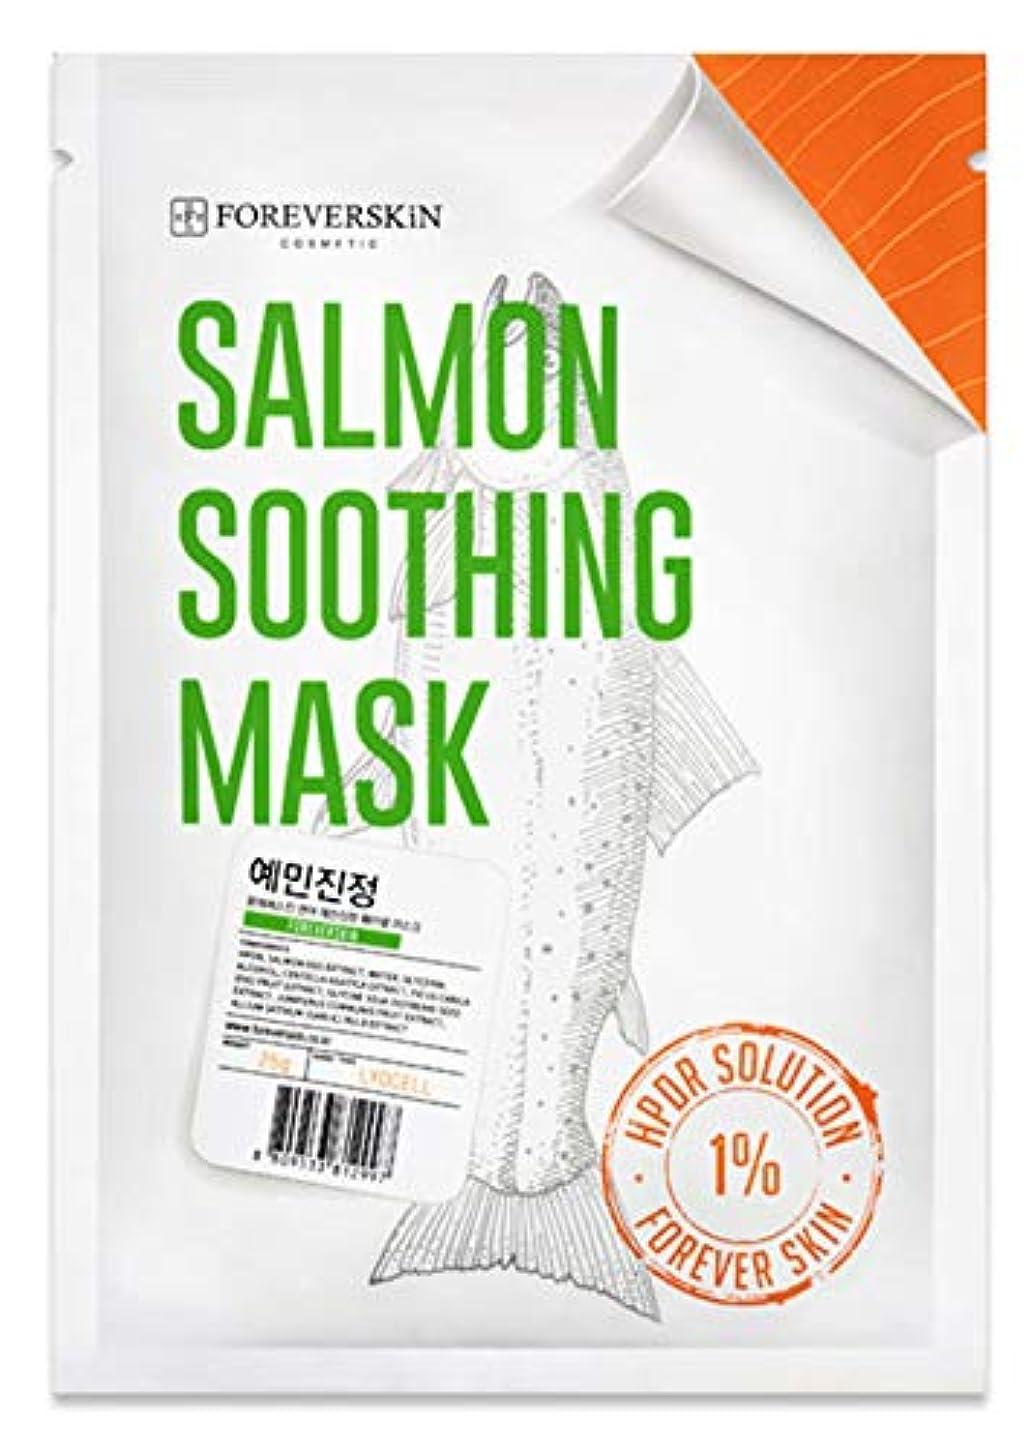 FOREVERSKIN サーモンマスクパック 韓国 シートマスク 高品質な 韓国コスメ 韓国パック リジュランの入った フェイスマスク フェイスパック (鎮静(10枚))